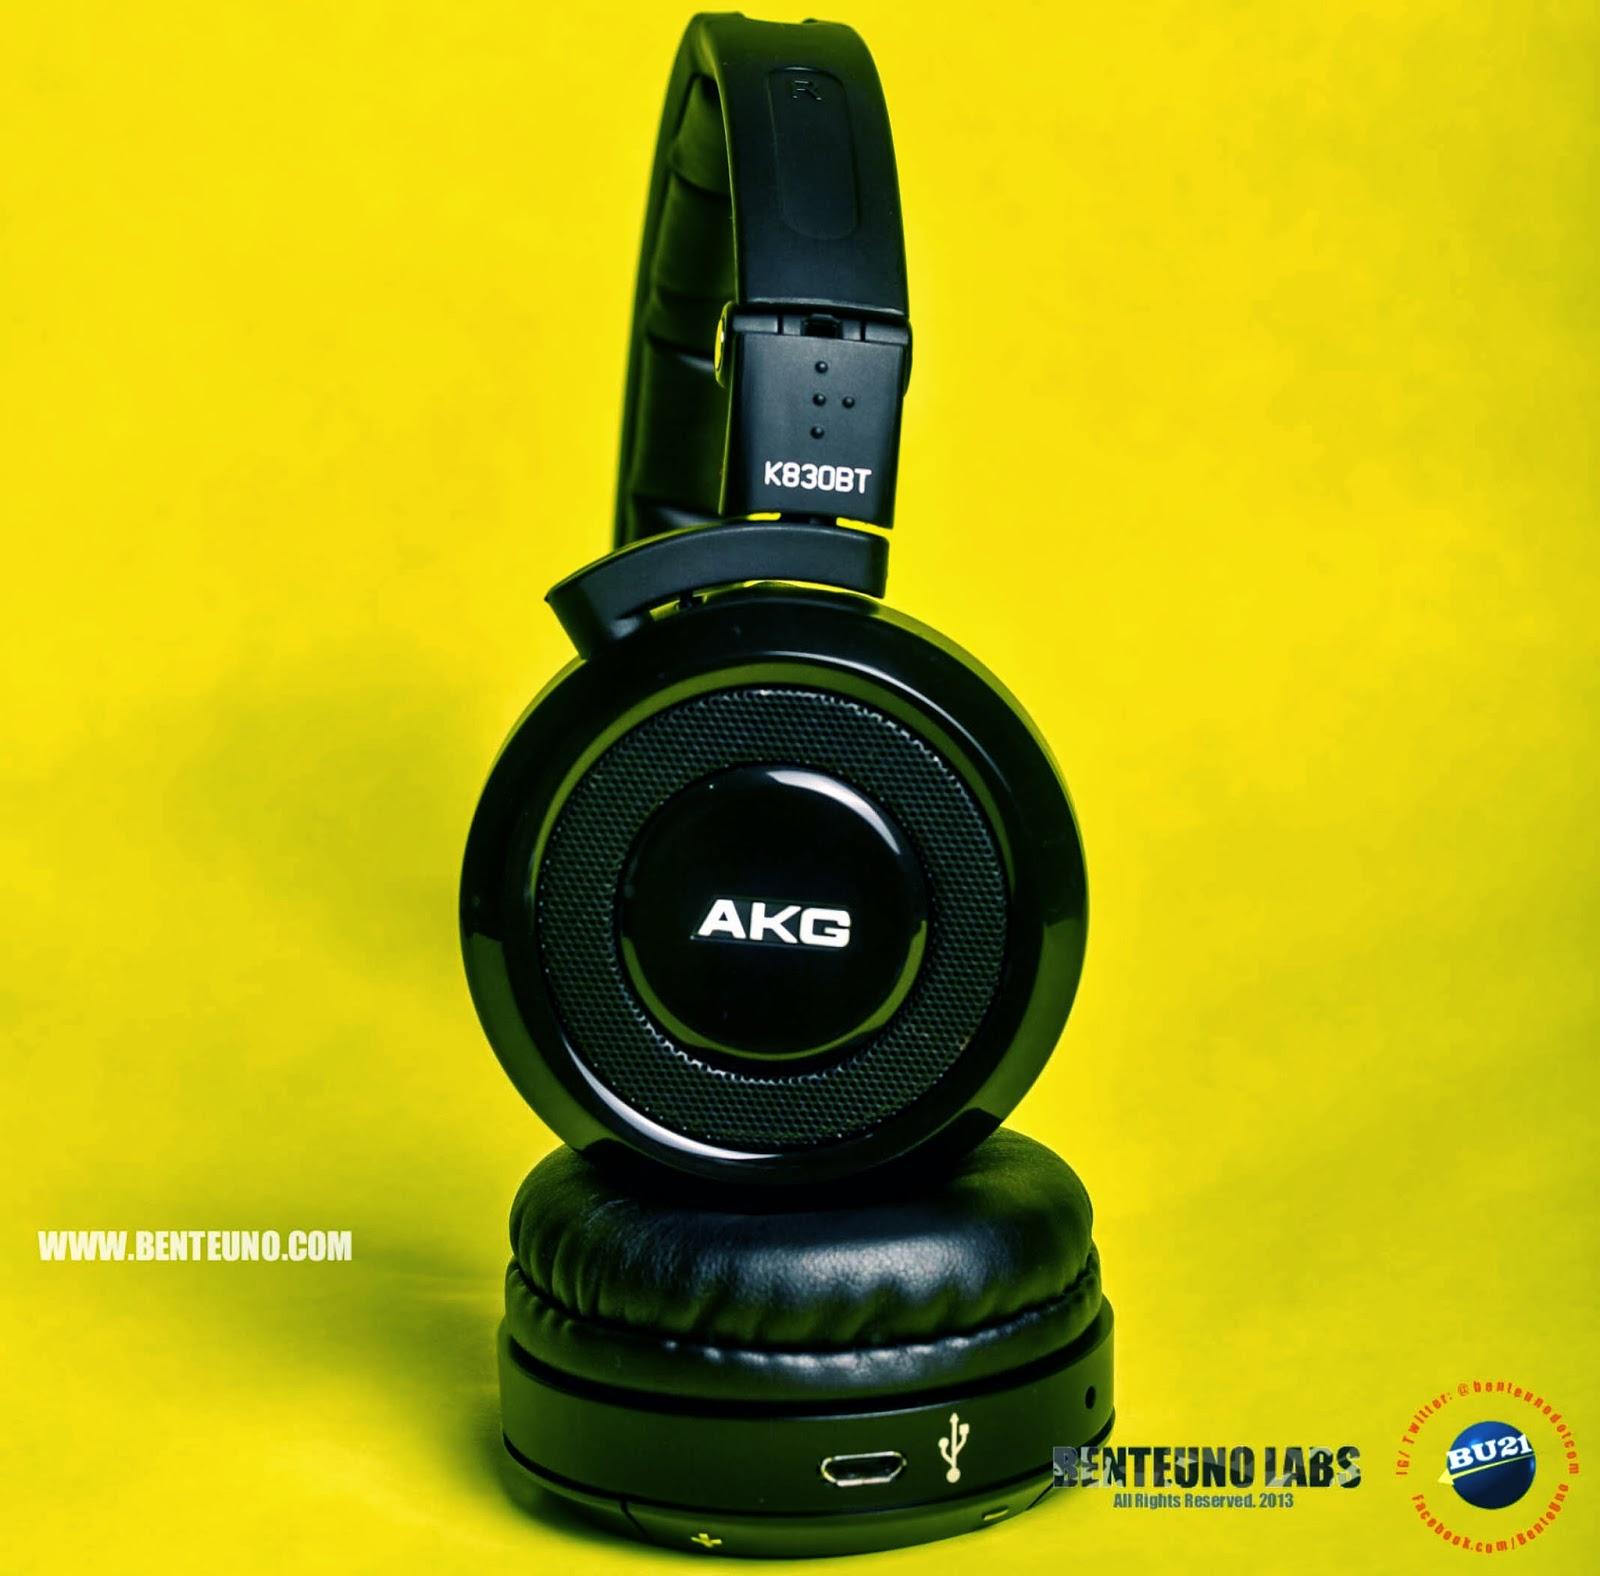 AKG K830 BT Wireless headphones picture